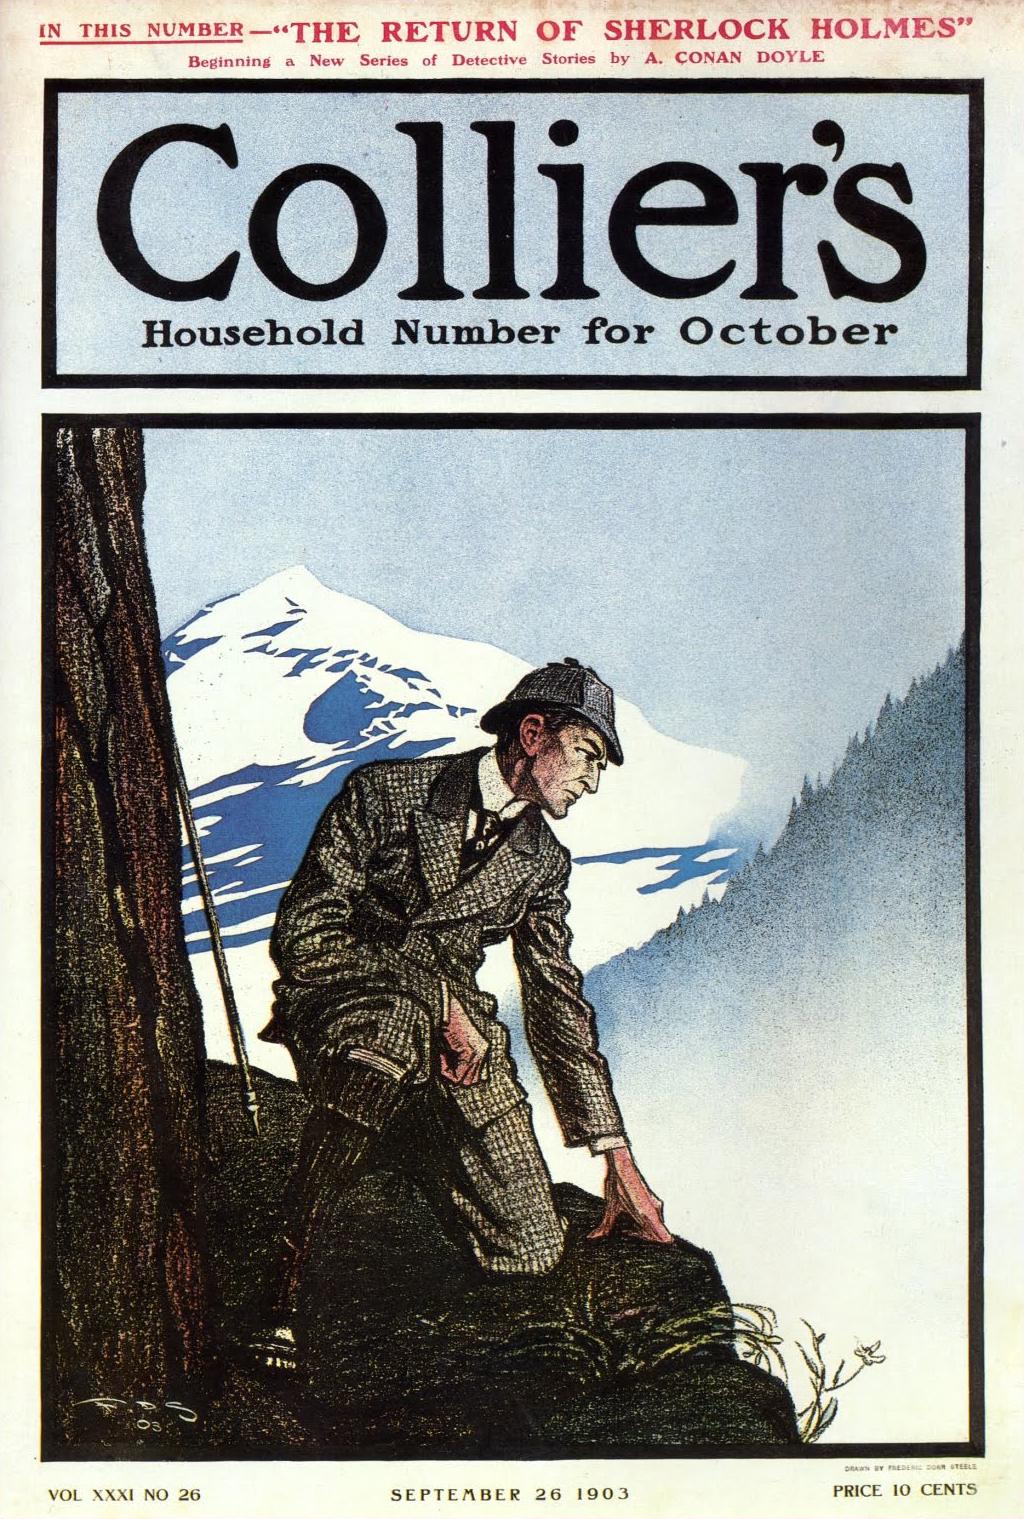 Sherlock Colliers-1903-09-26